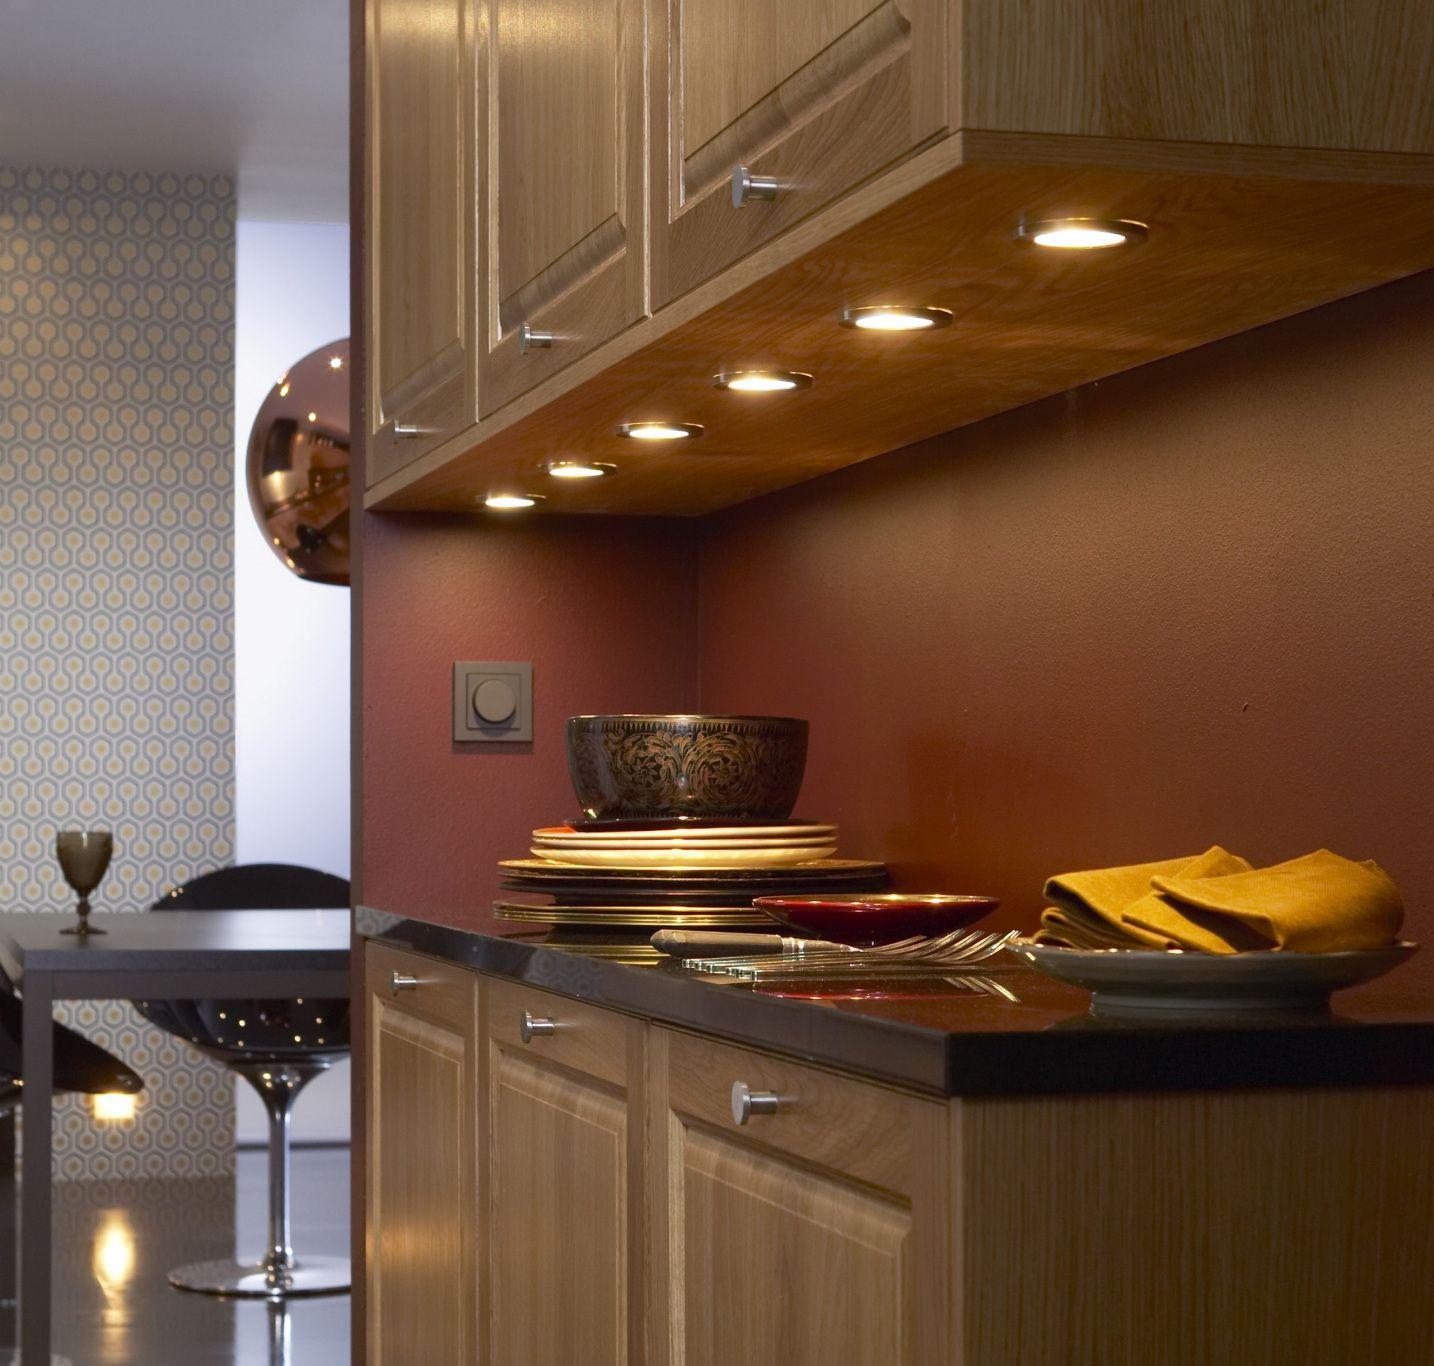 50+ Kitchen Under Cabinet Lighting Ideas - Small Kitchen Renovation ...